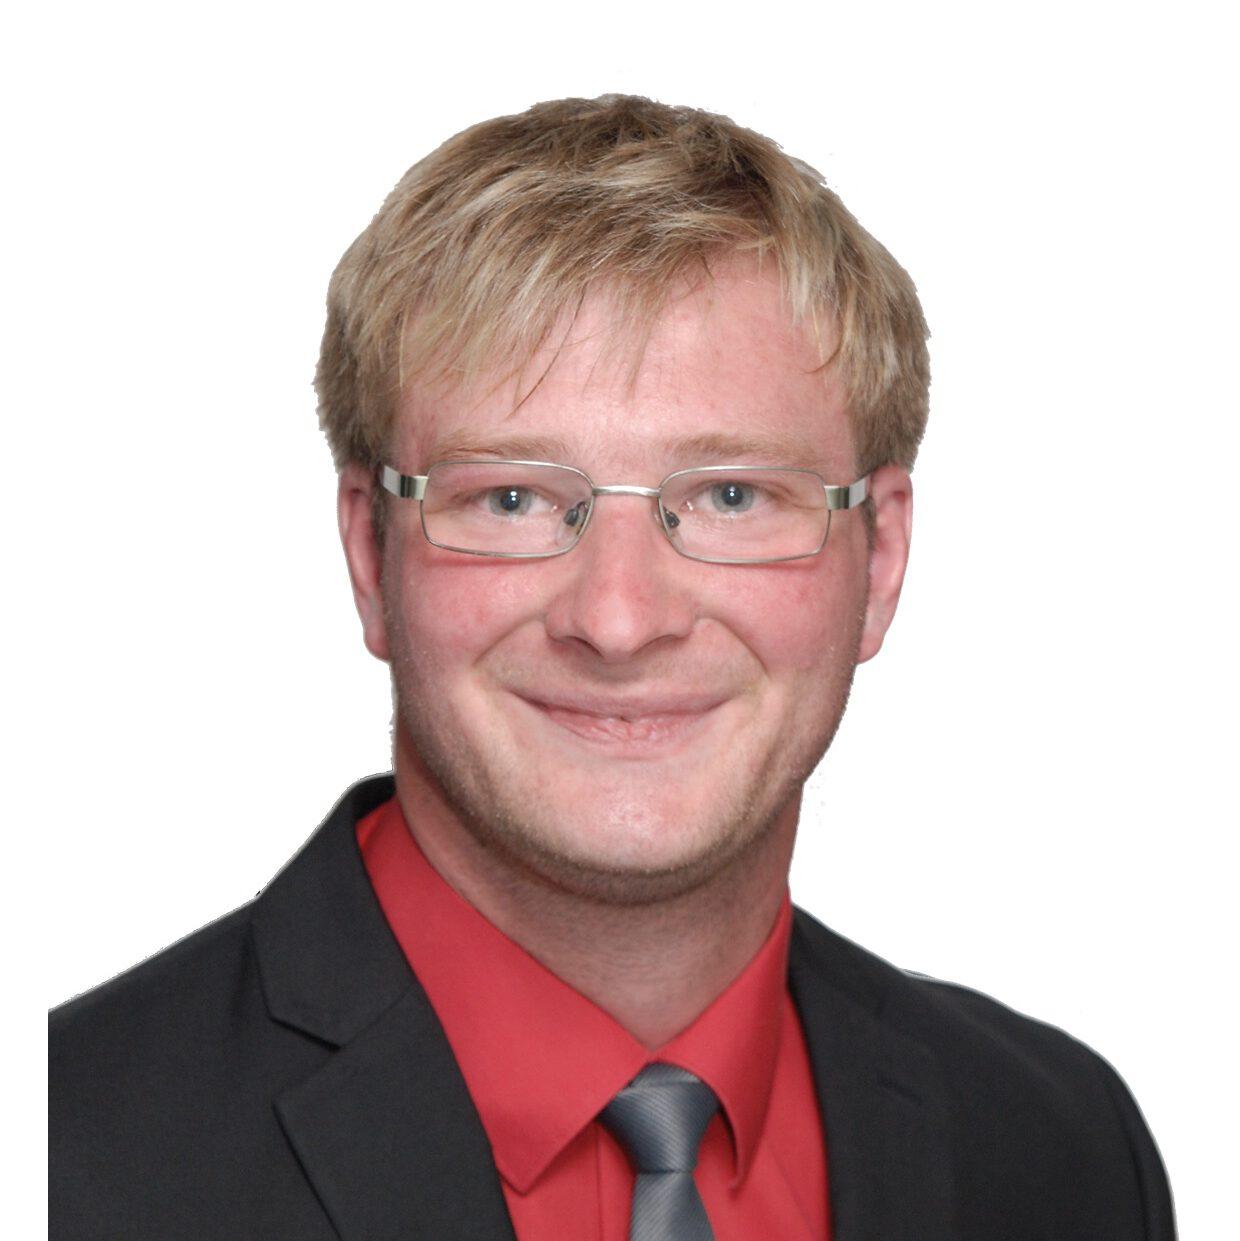 Dominik Hendelkens